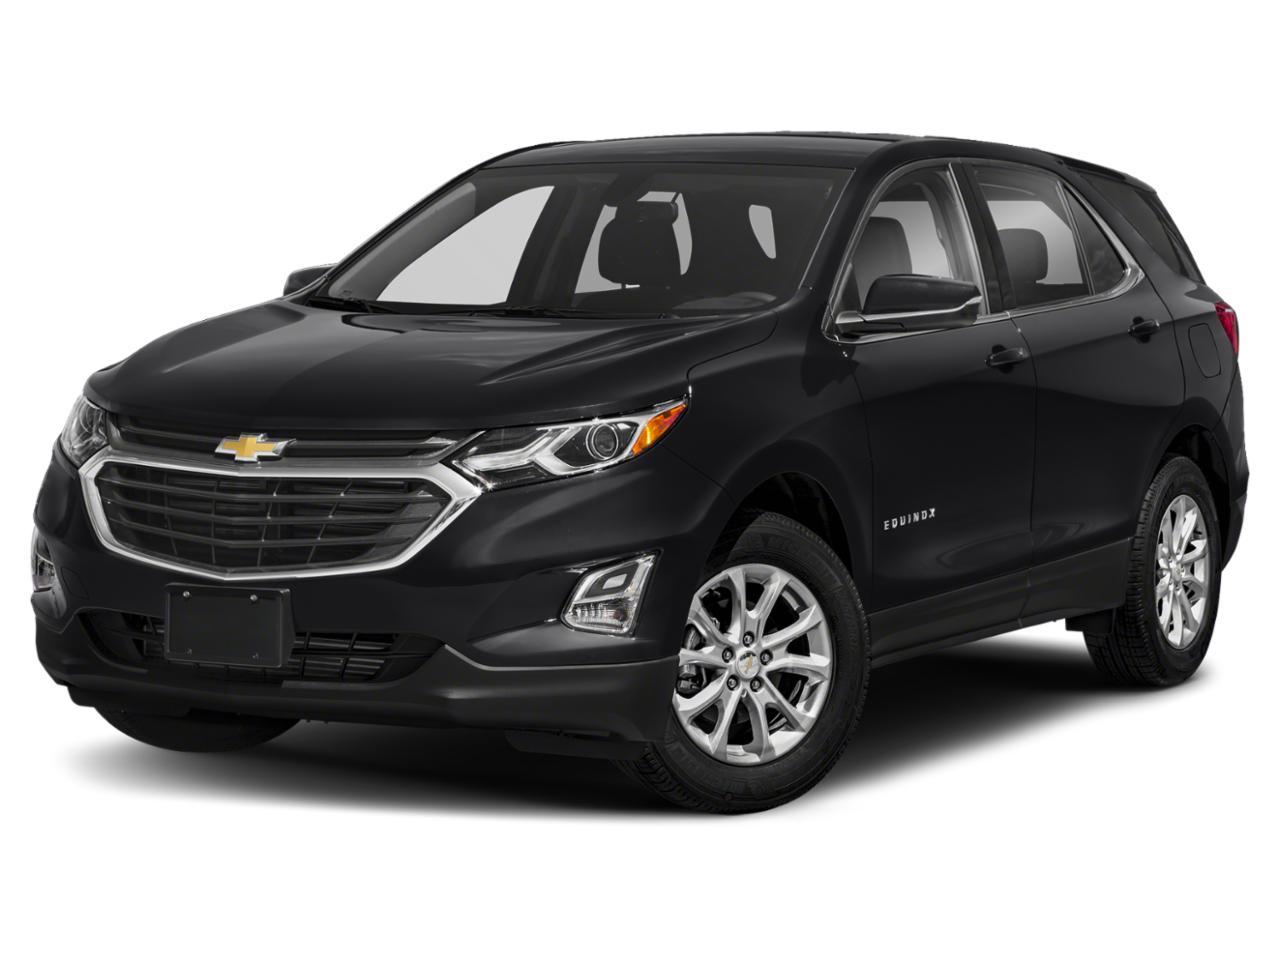 2018 Chevrolet Equinox Vehicle Photo in TERRYVILLE, CT 06786-5904